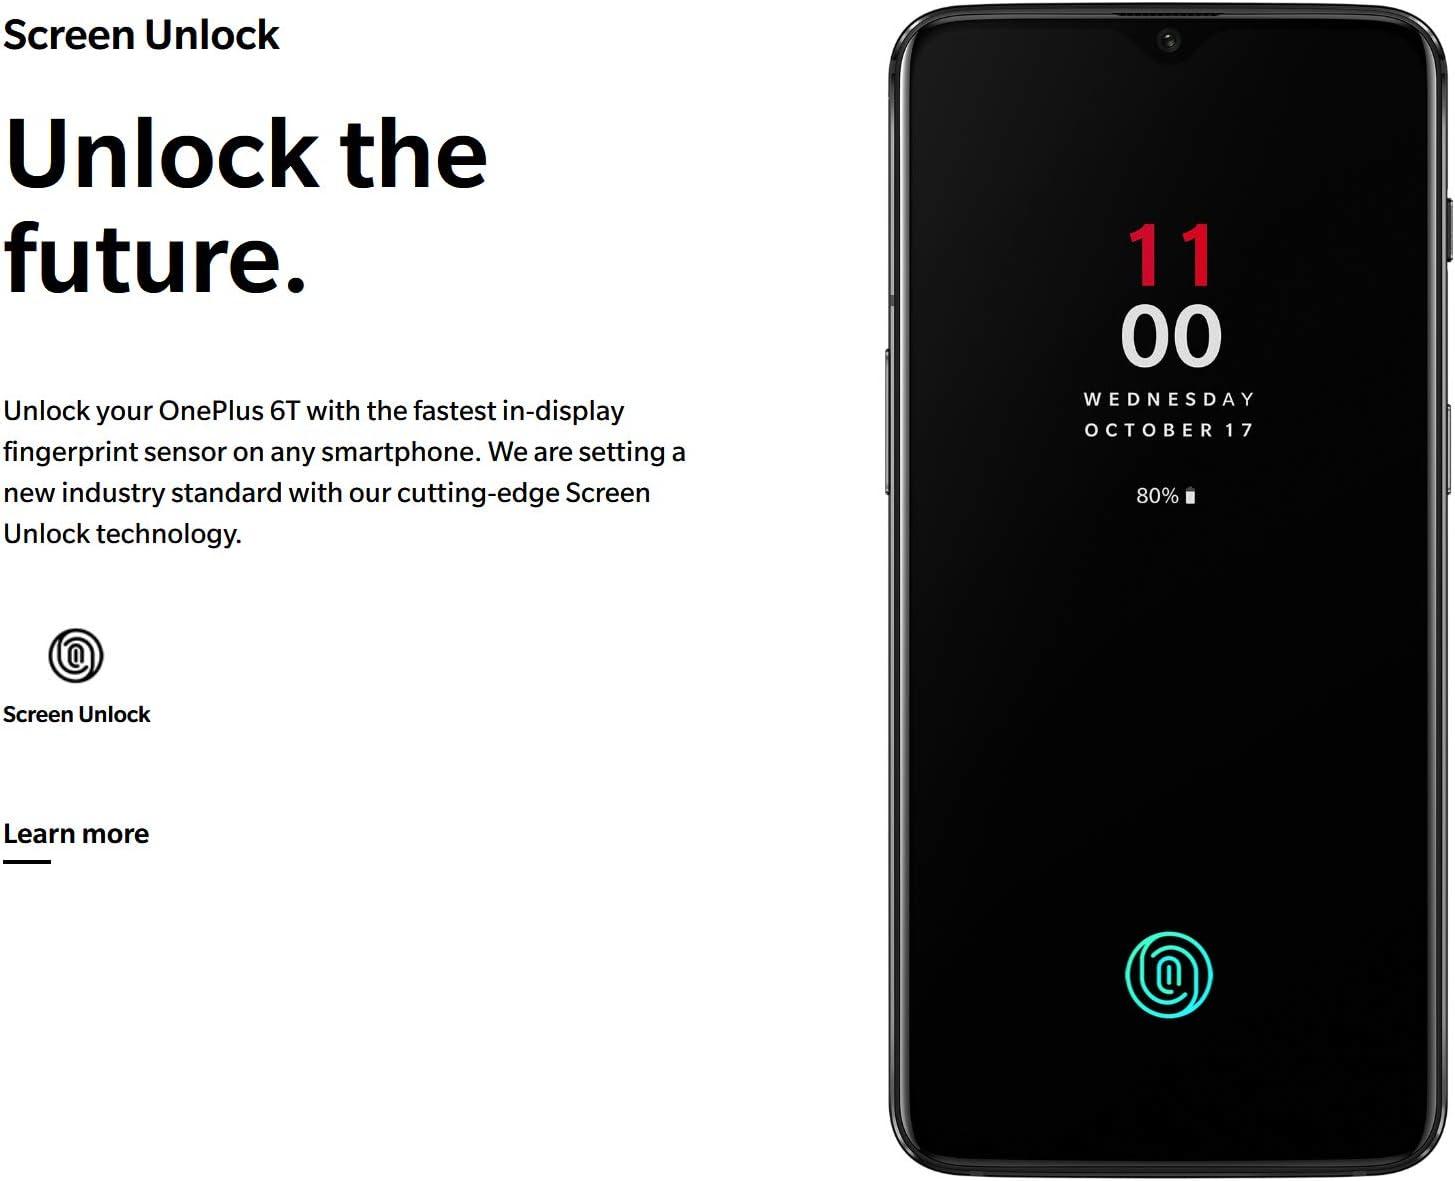 OnePlus 6T A6010 McLaren Edition 256GB Storage + 10GB Memory ...